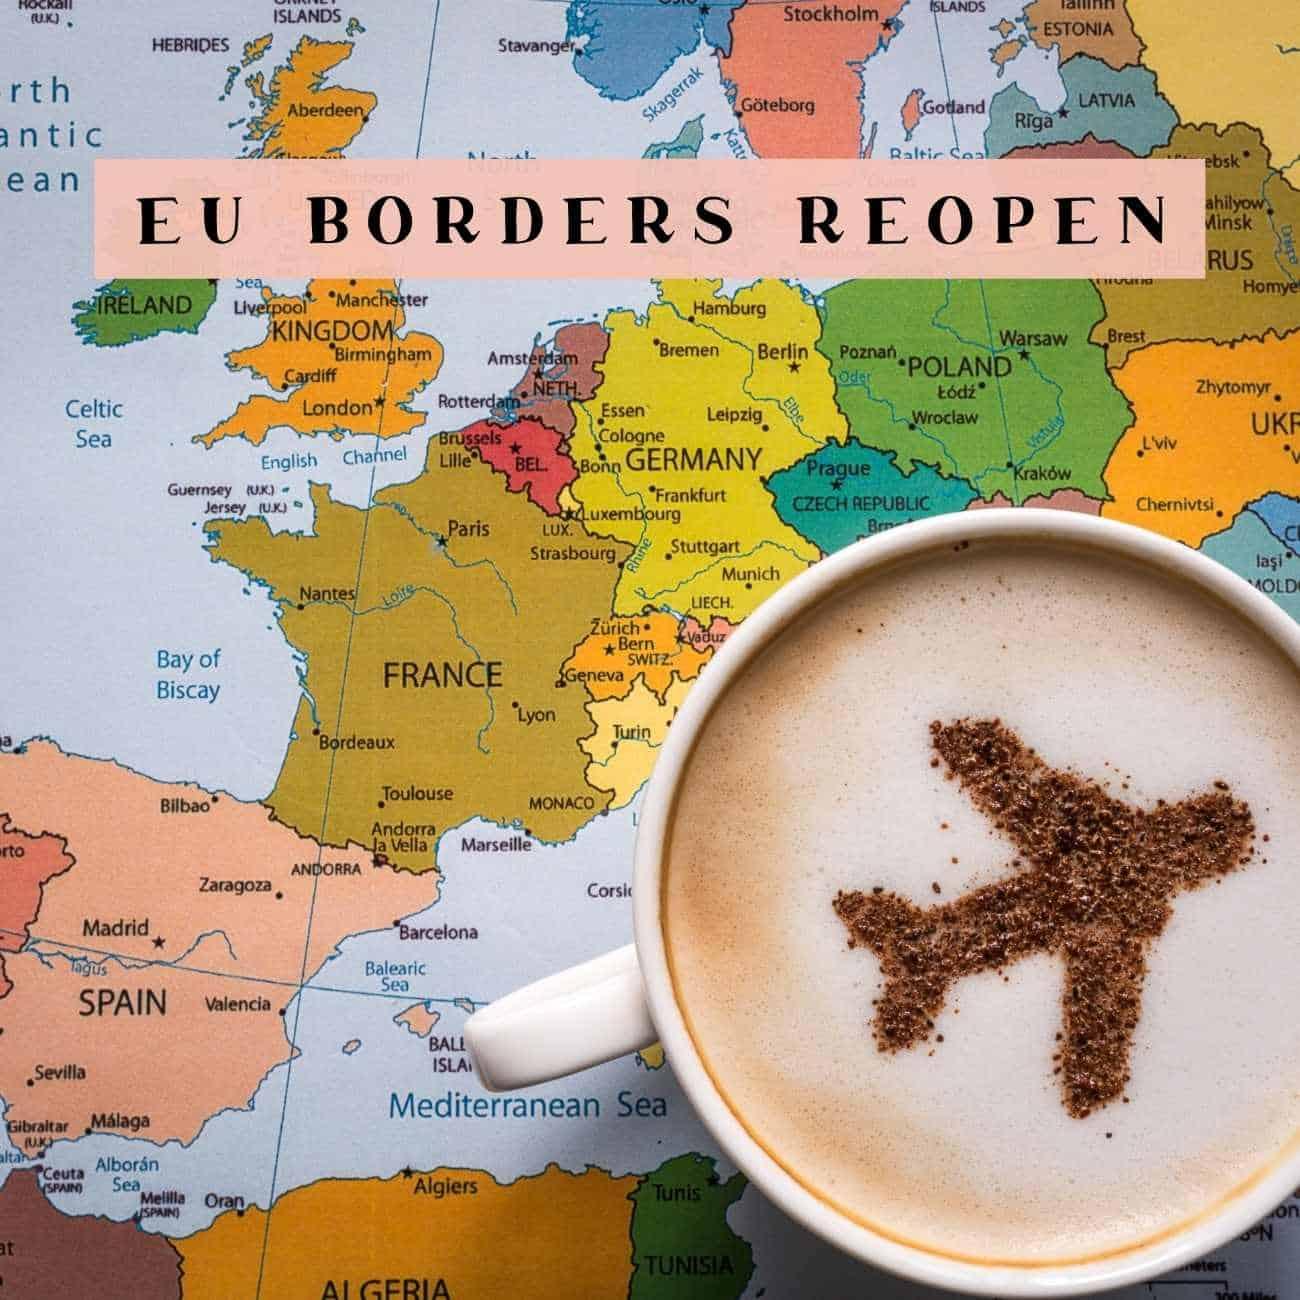 EU Borders reopening